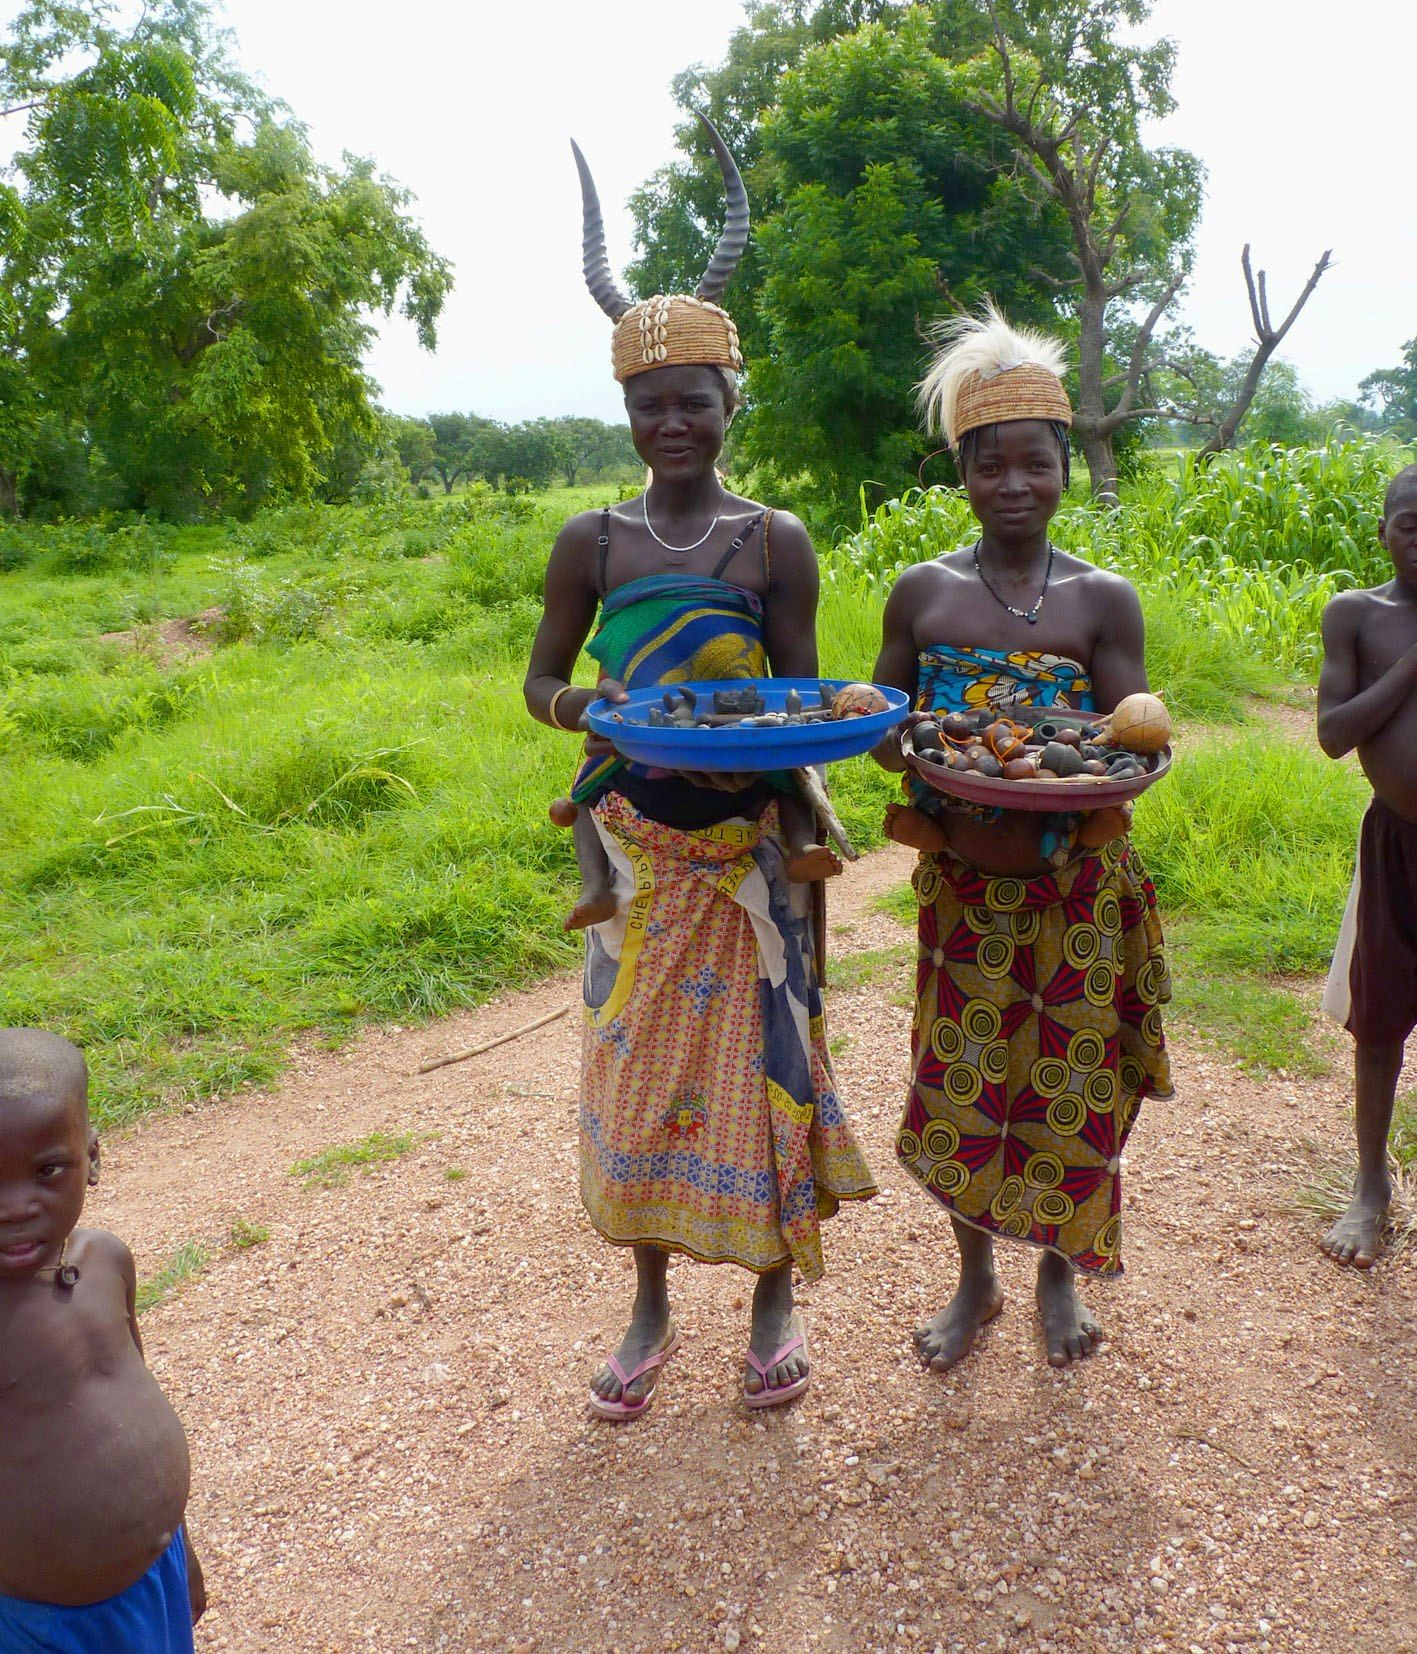 Femmes Tem Ankh Life Africa African Morocco